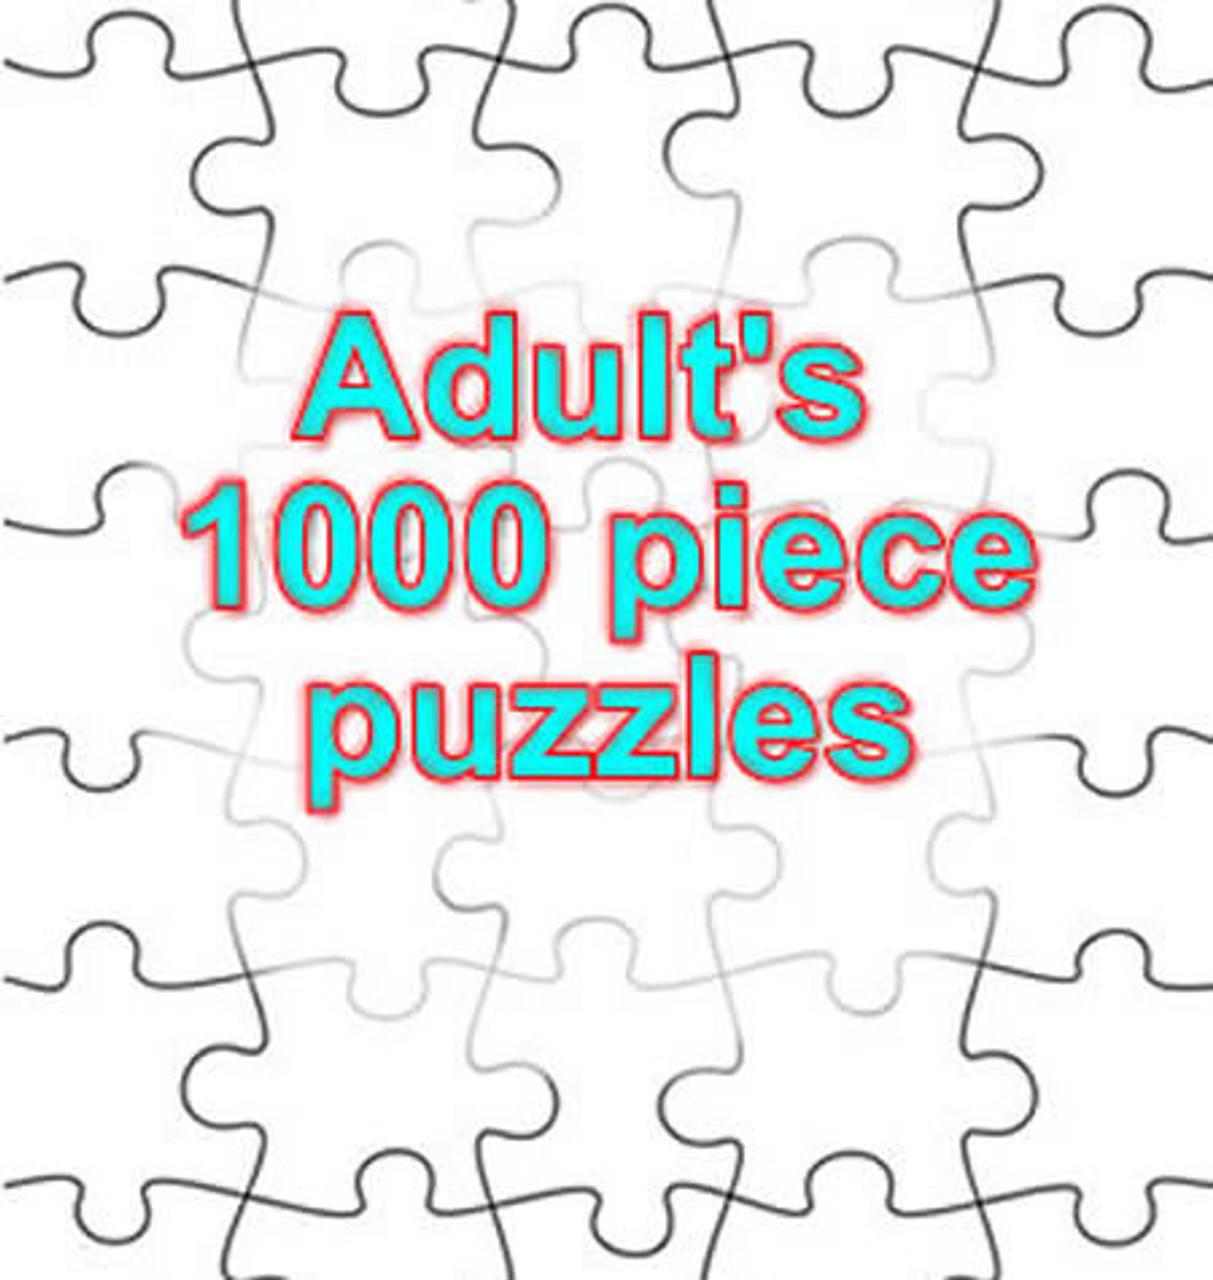 1,000 PIECE PUZZLES